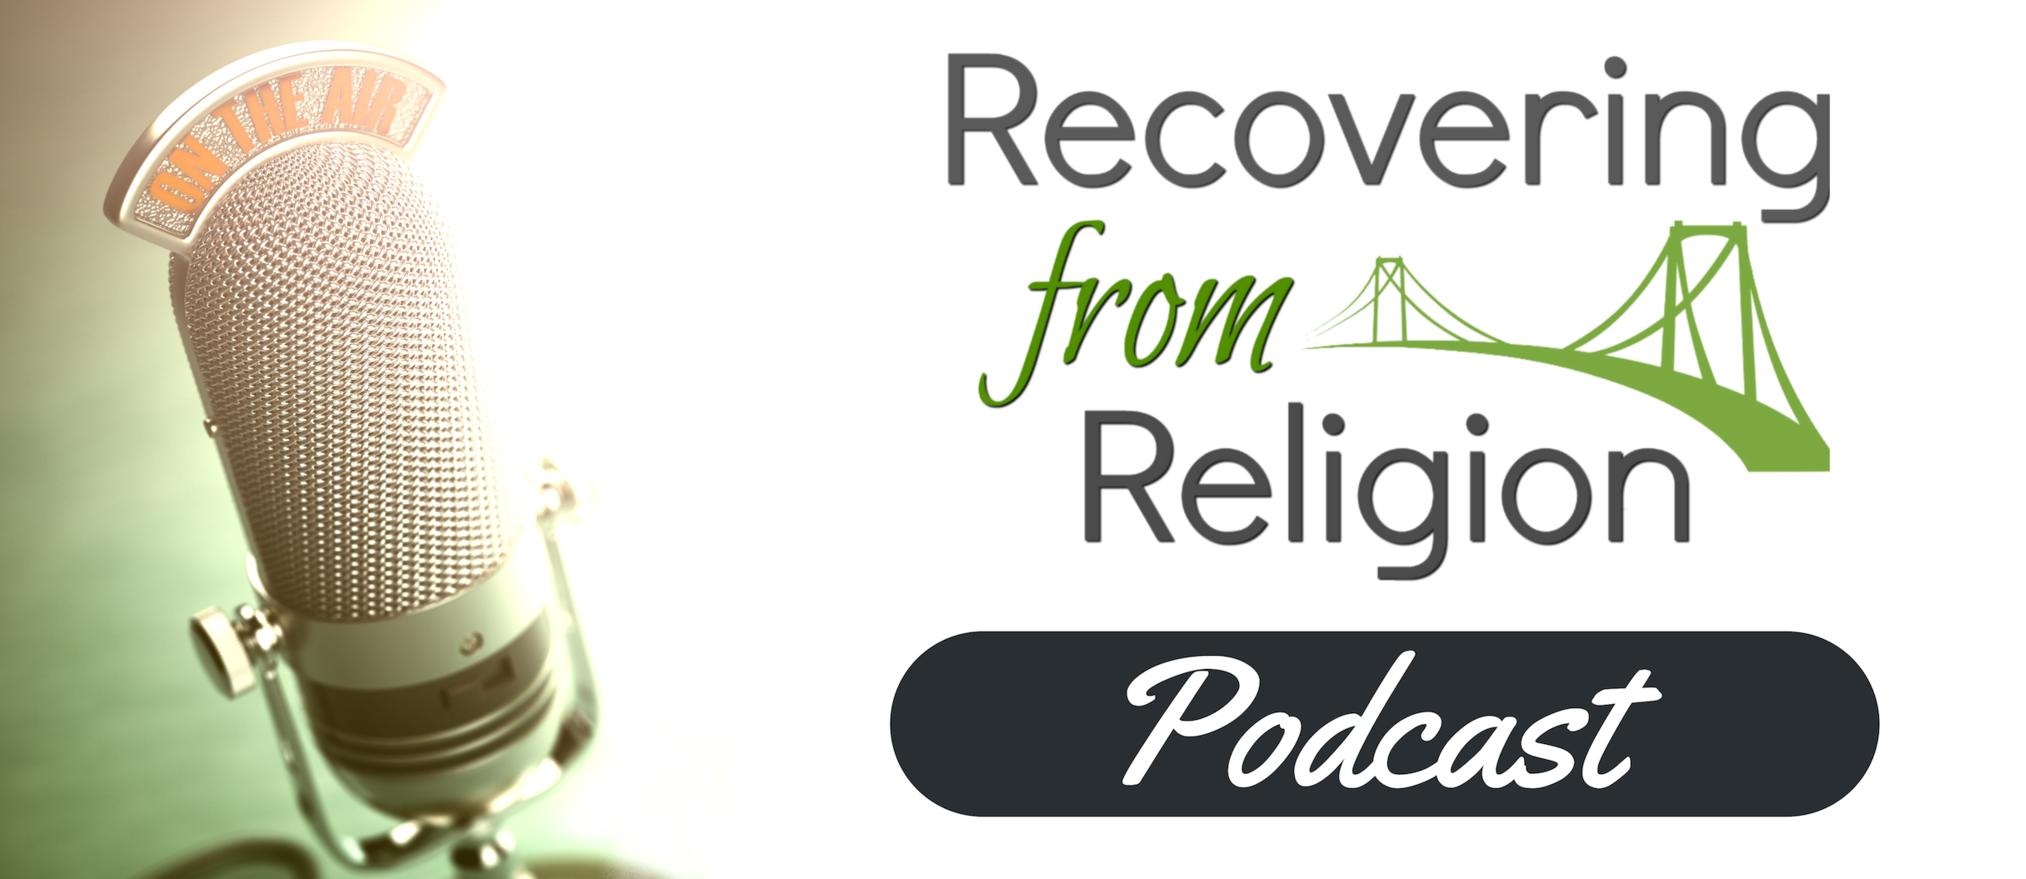 RfR Podcast Logo.png